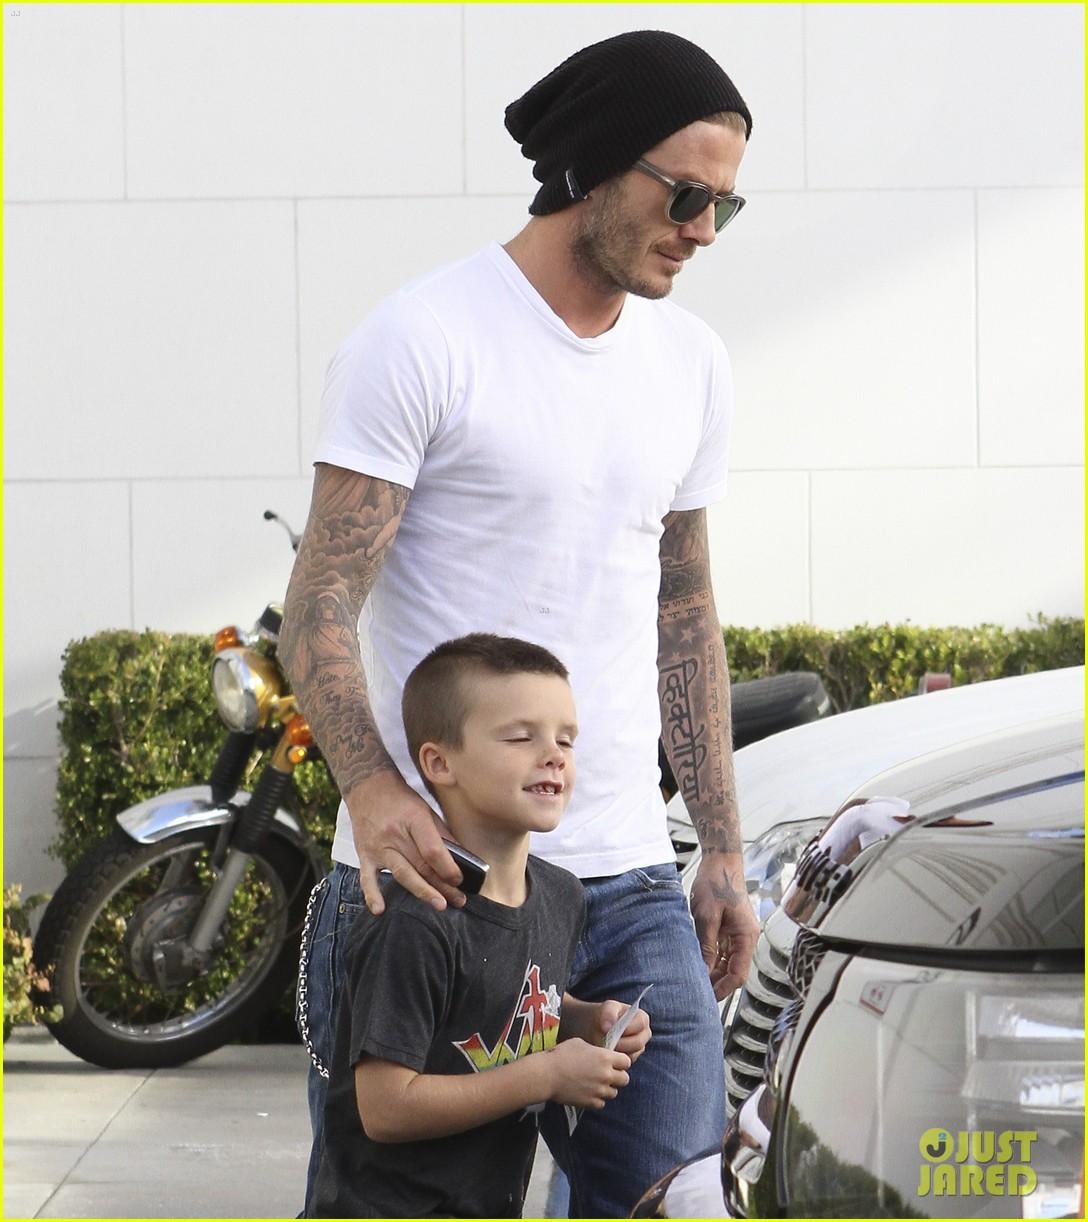 David Beckham: Shopping with Romeo & Cruz! David Beckham